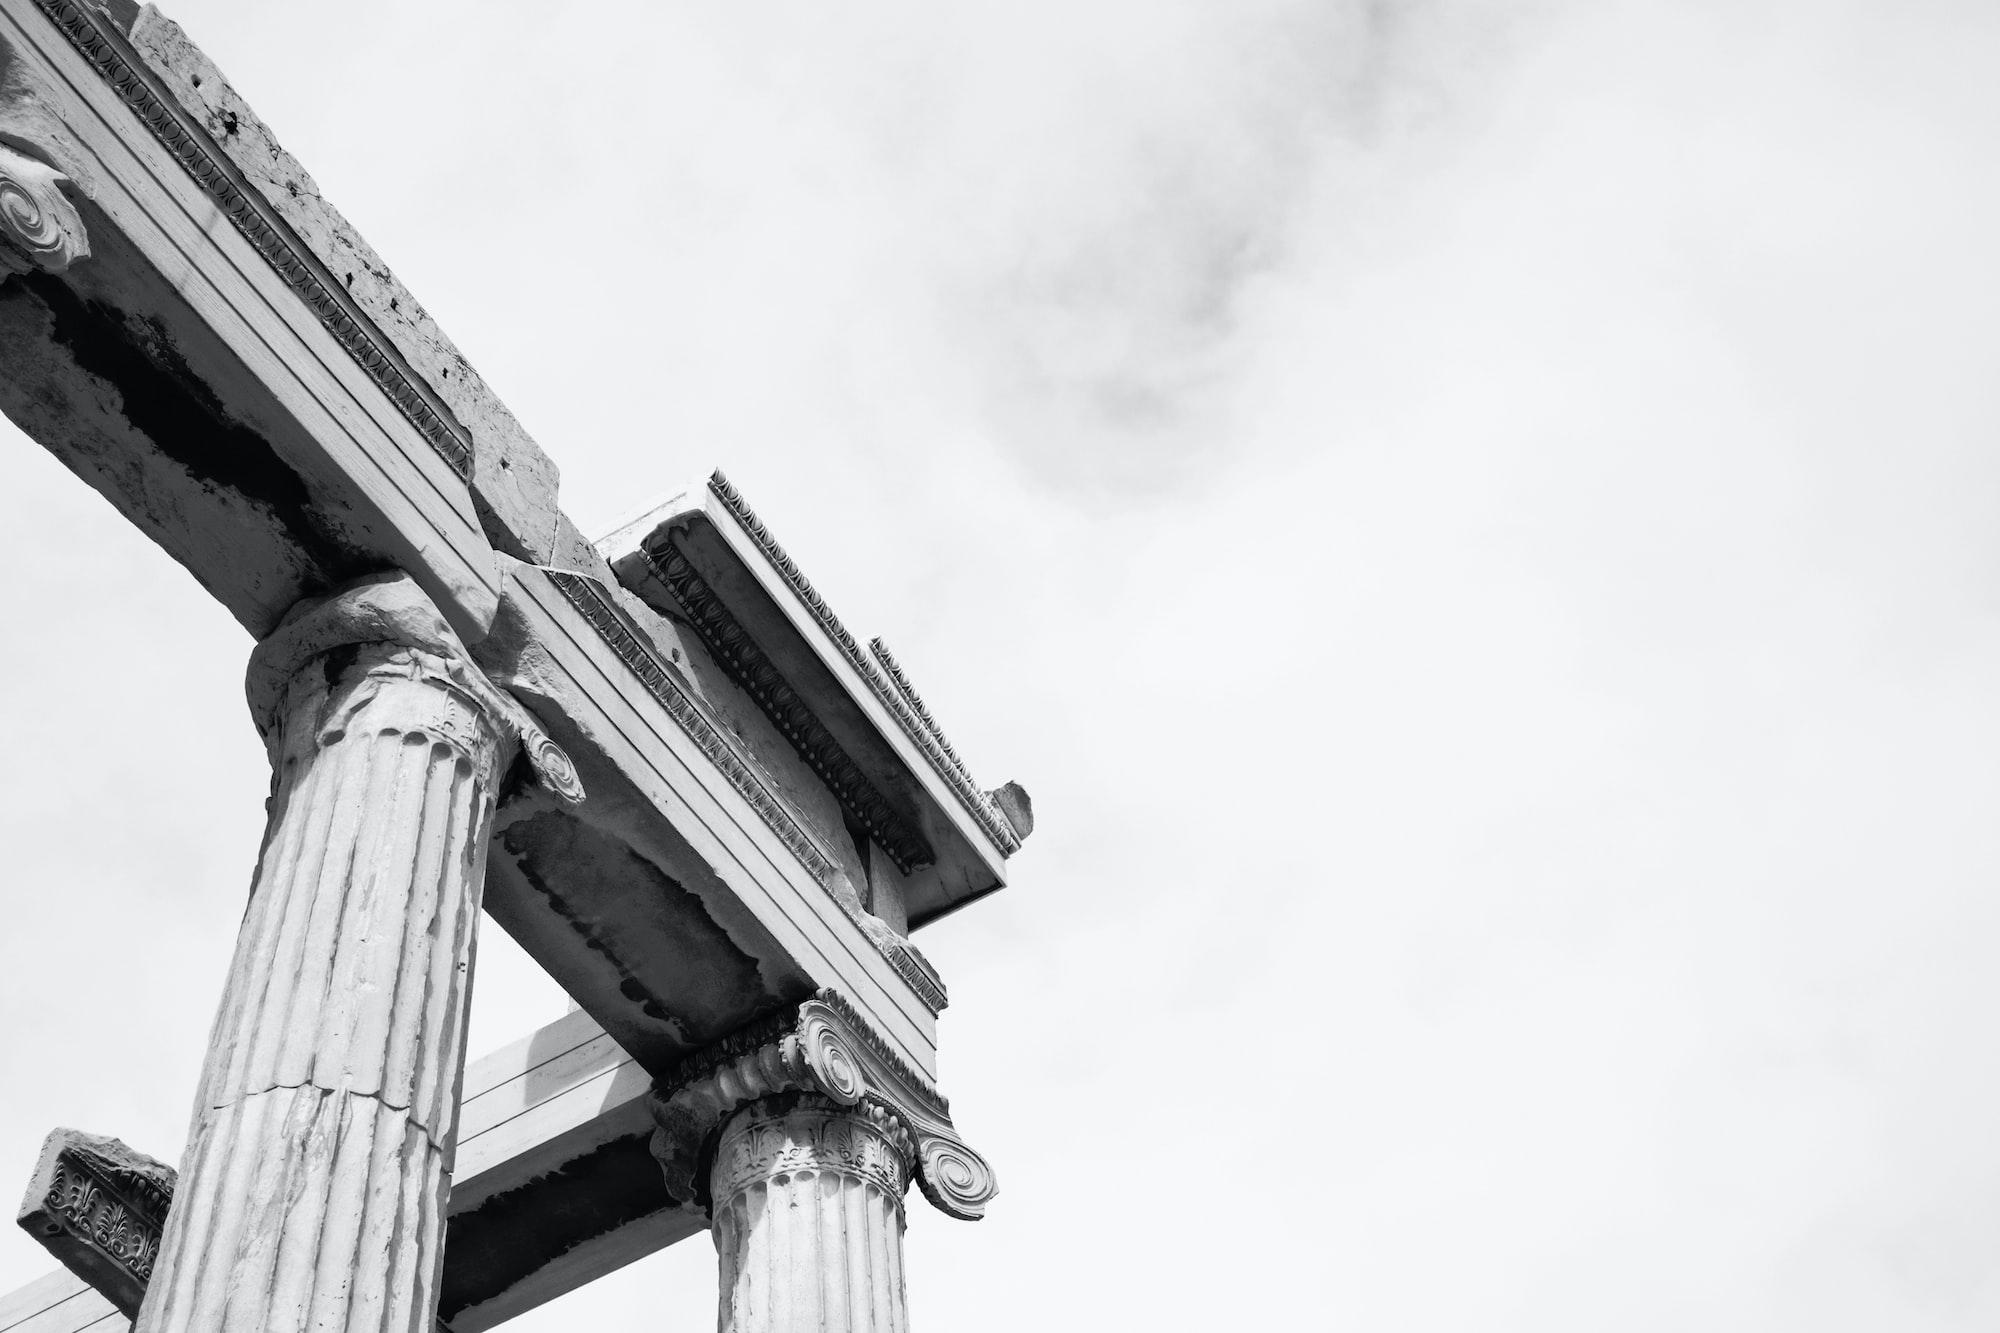 Towards Technopoly: The Judgement of Thamus